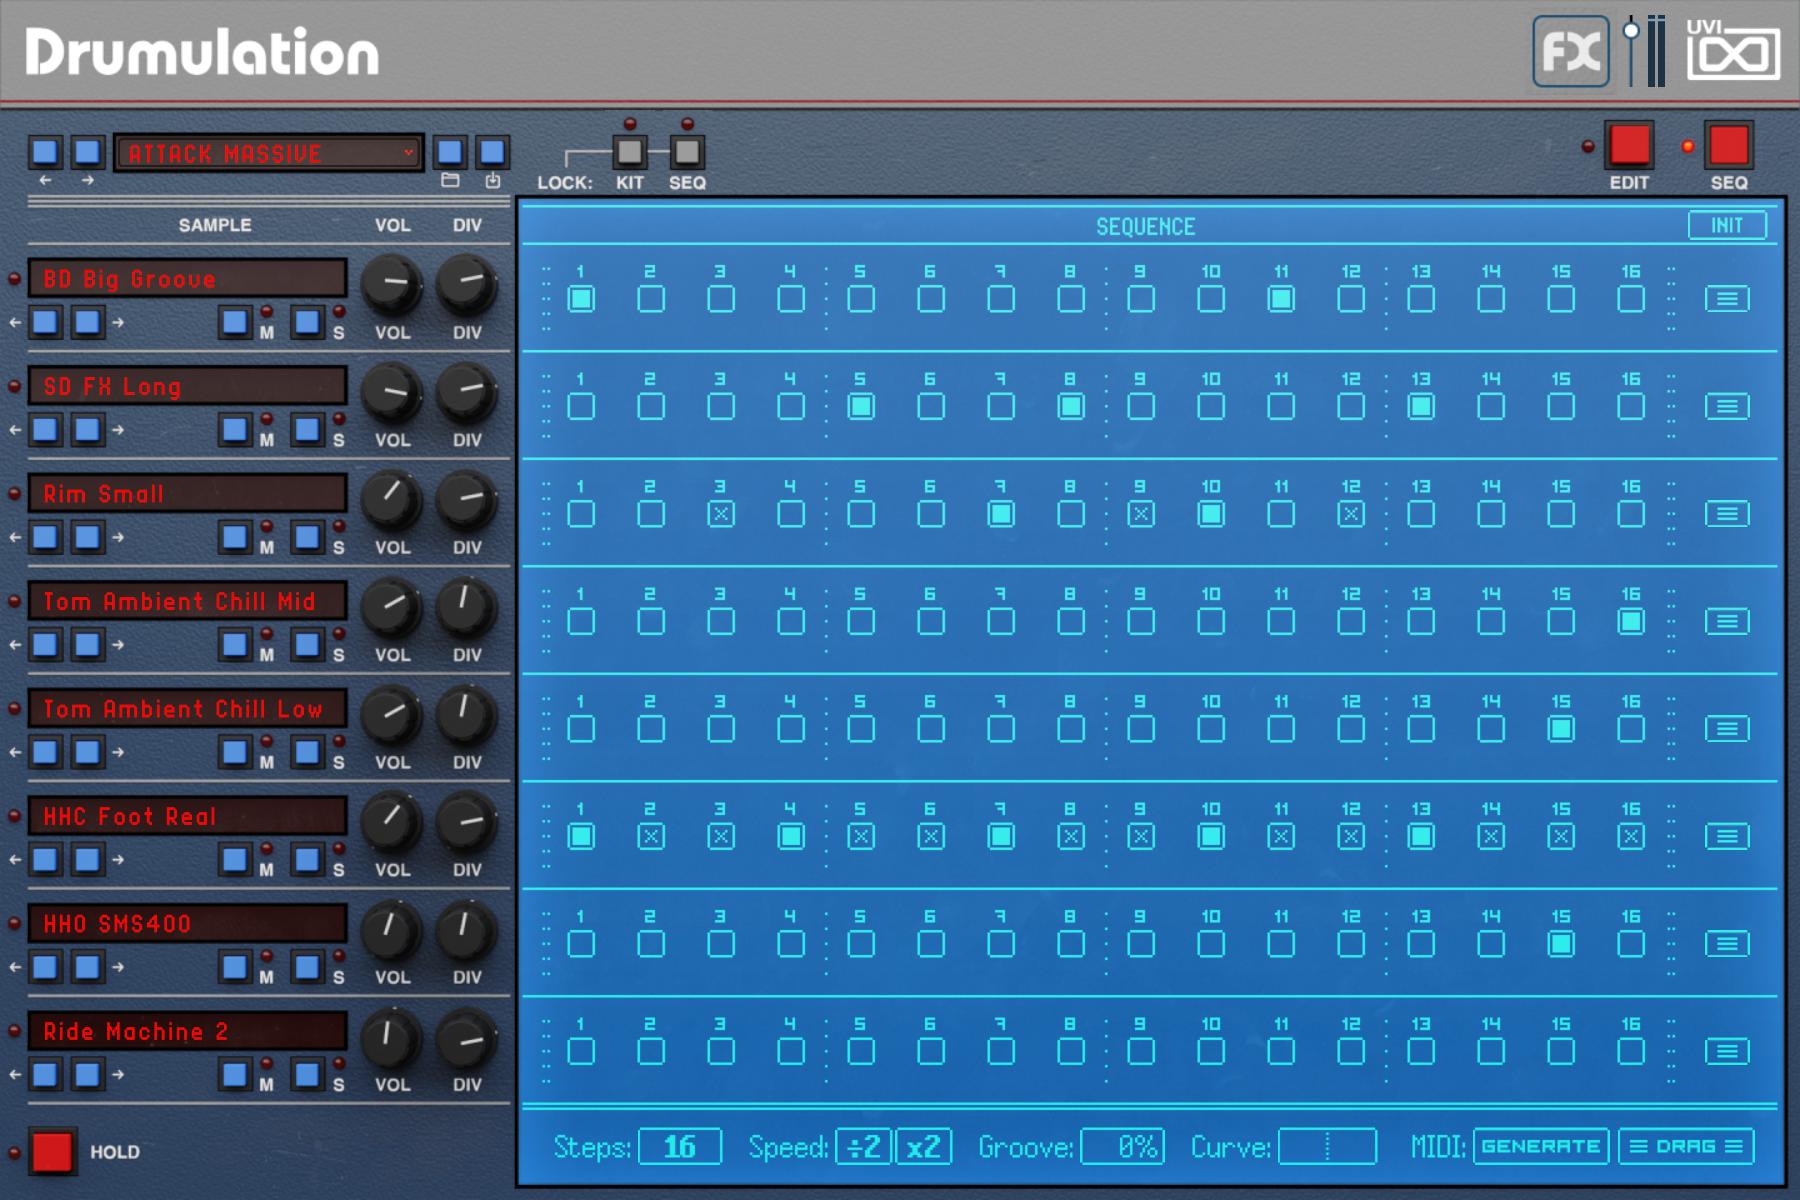 Emulation II+ | Drumulation Sequencer